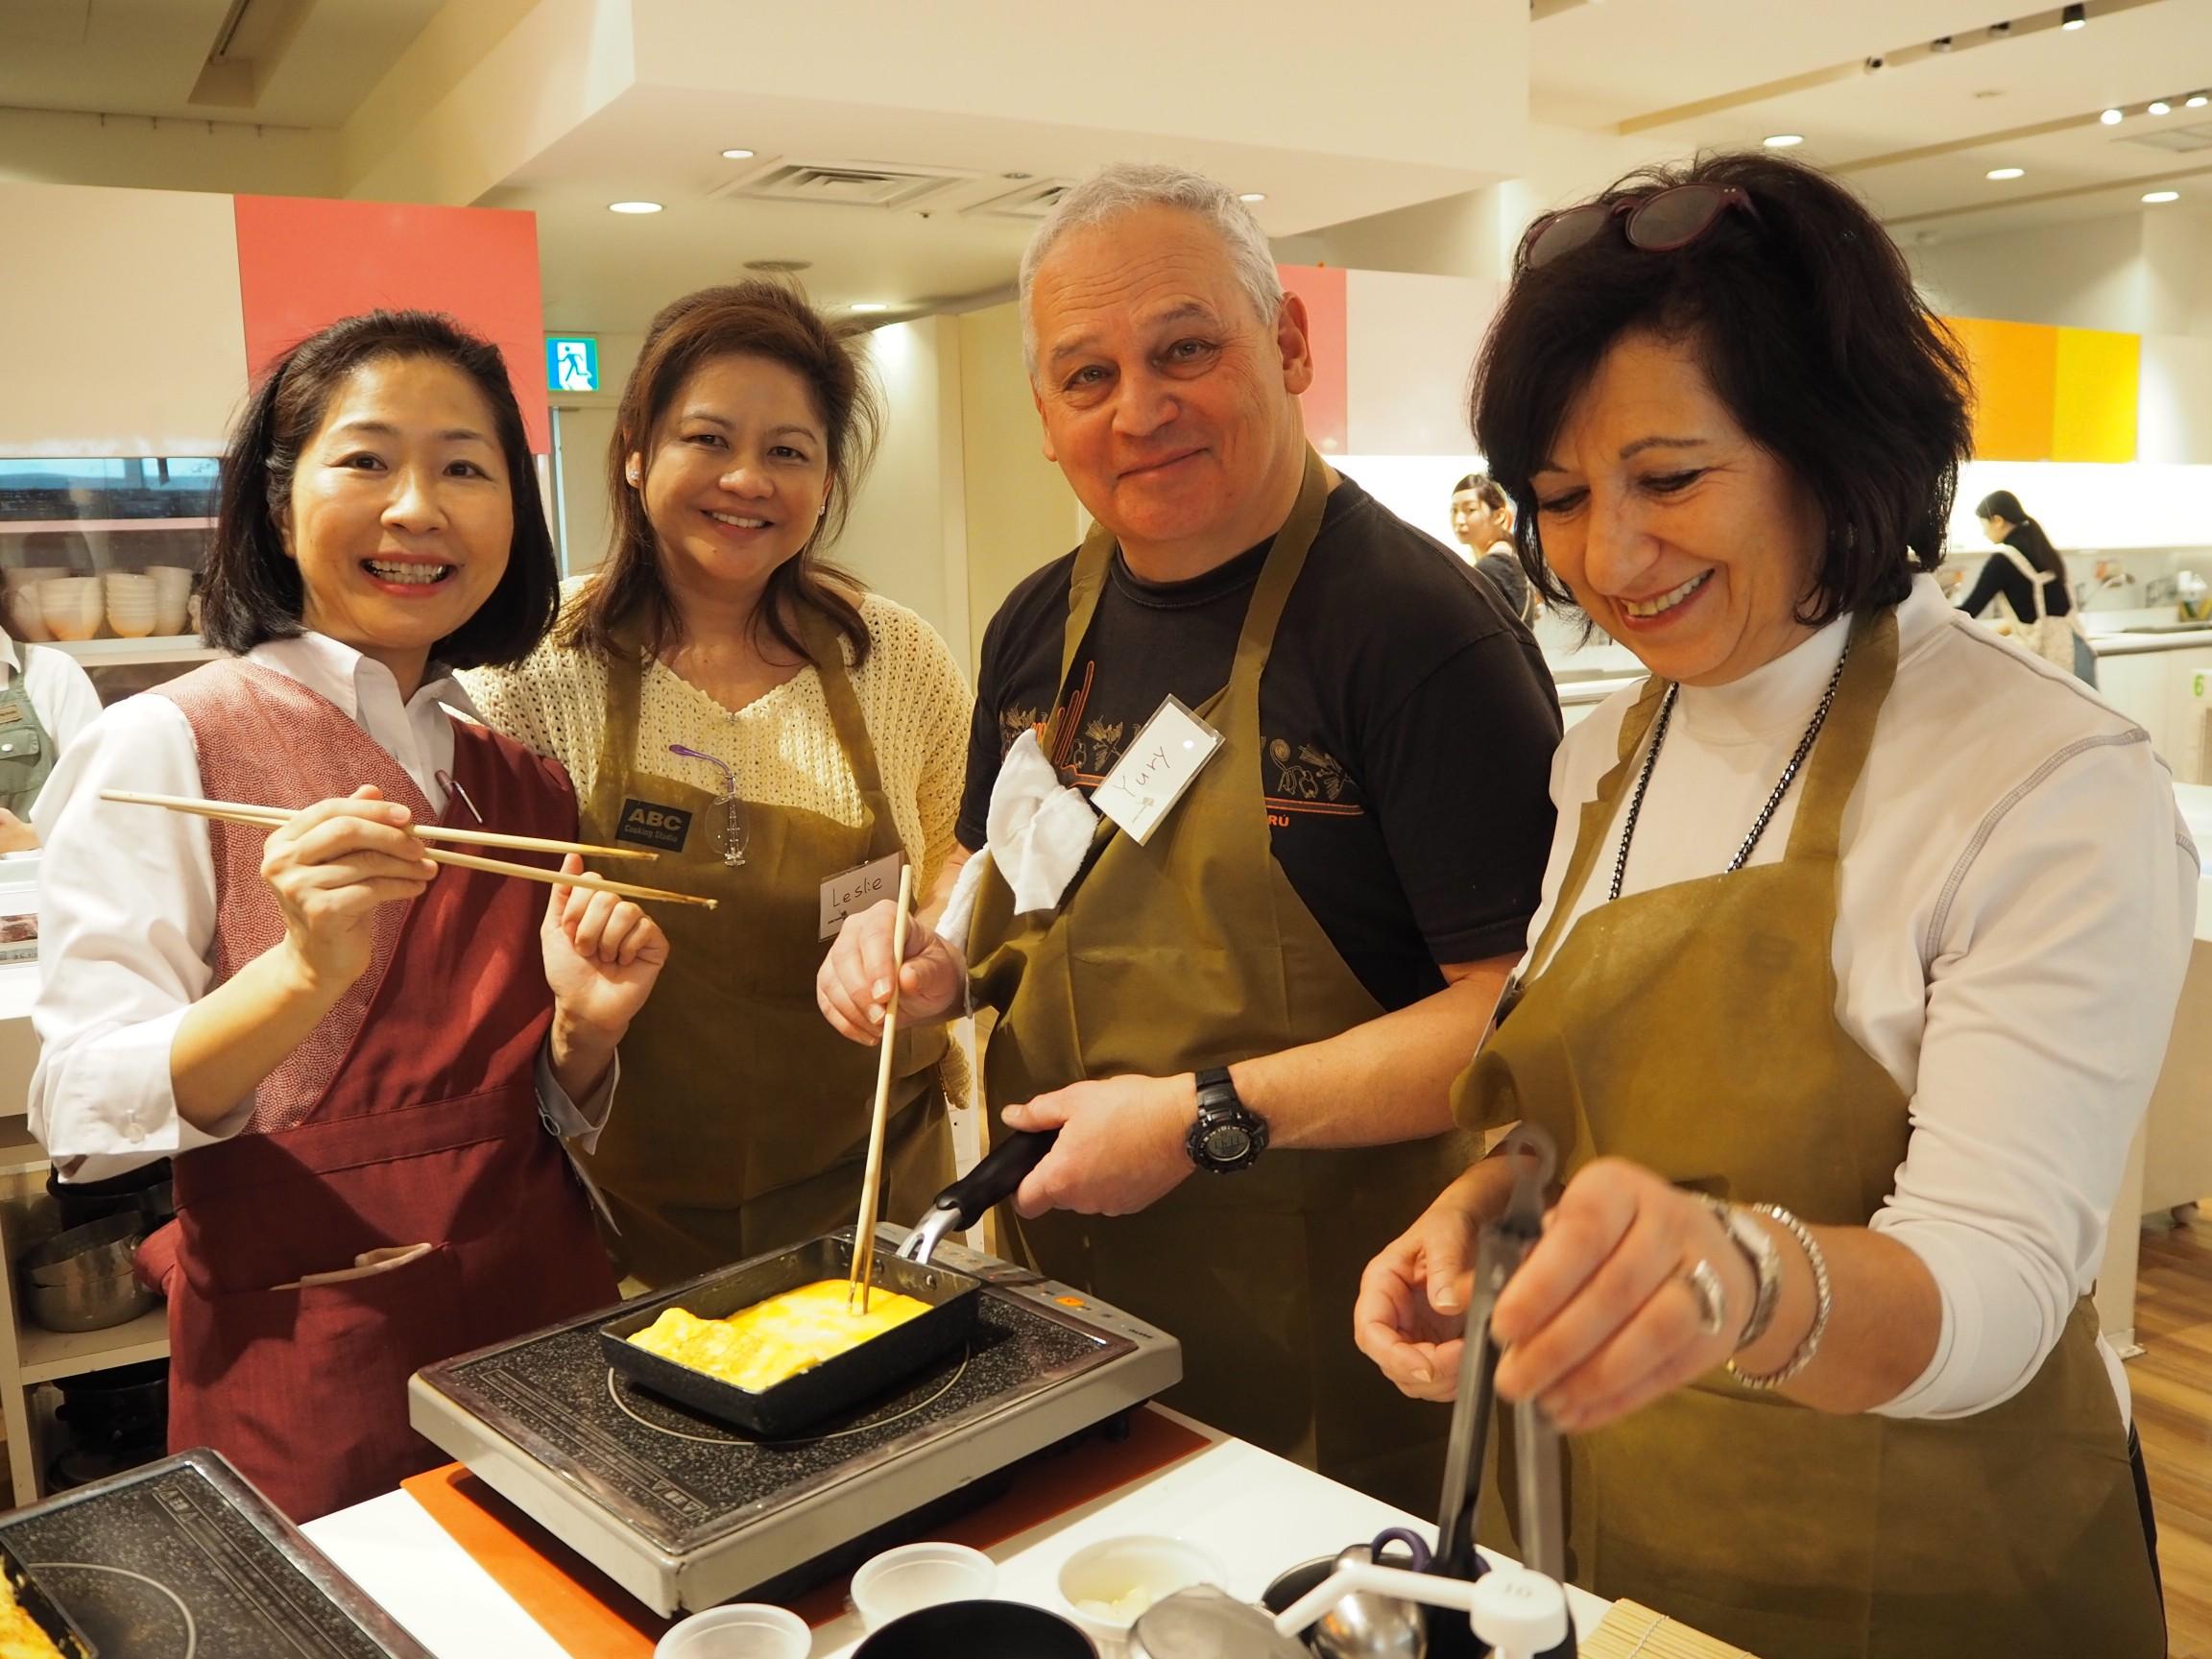 [AM] Tsukiji Outer Fish Market Tour + Rolled Sushi Cooking Class